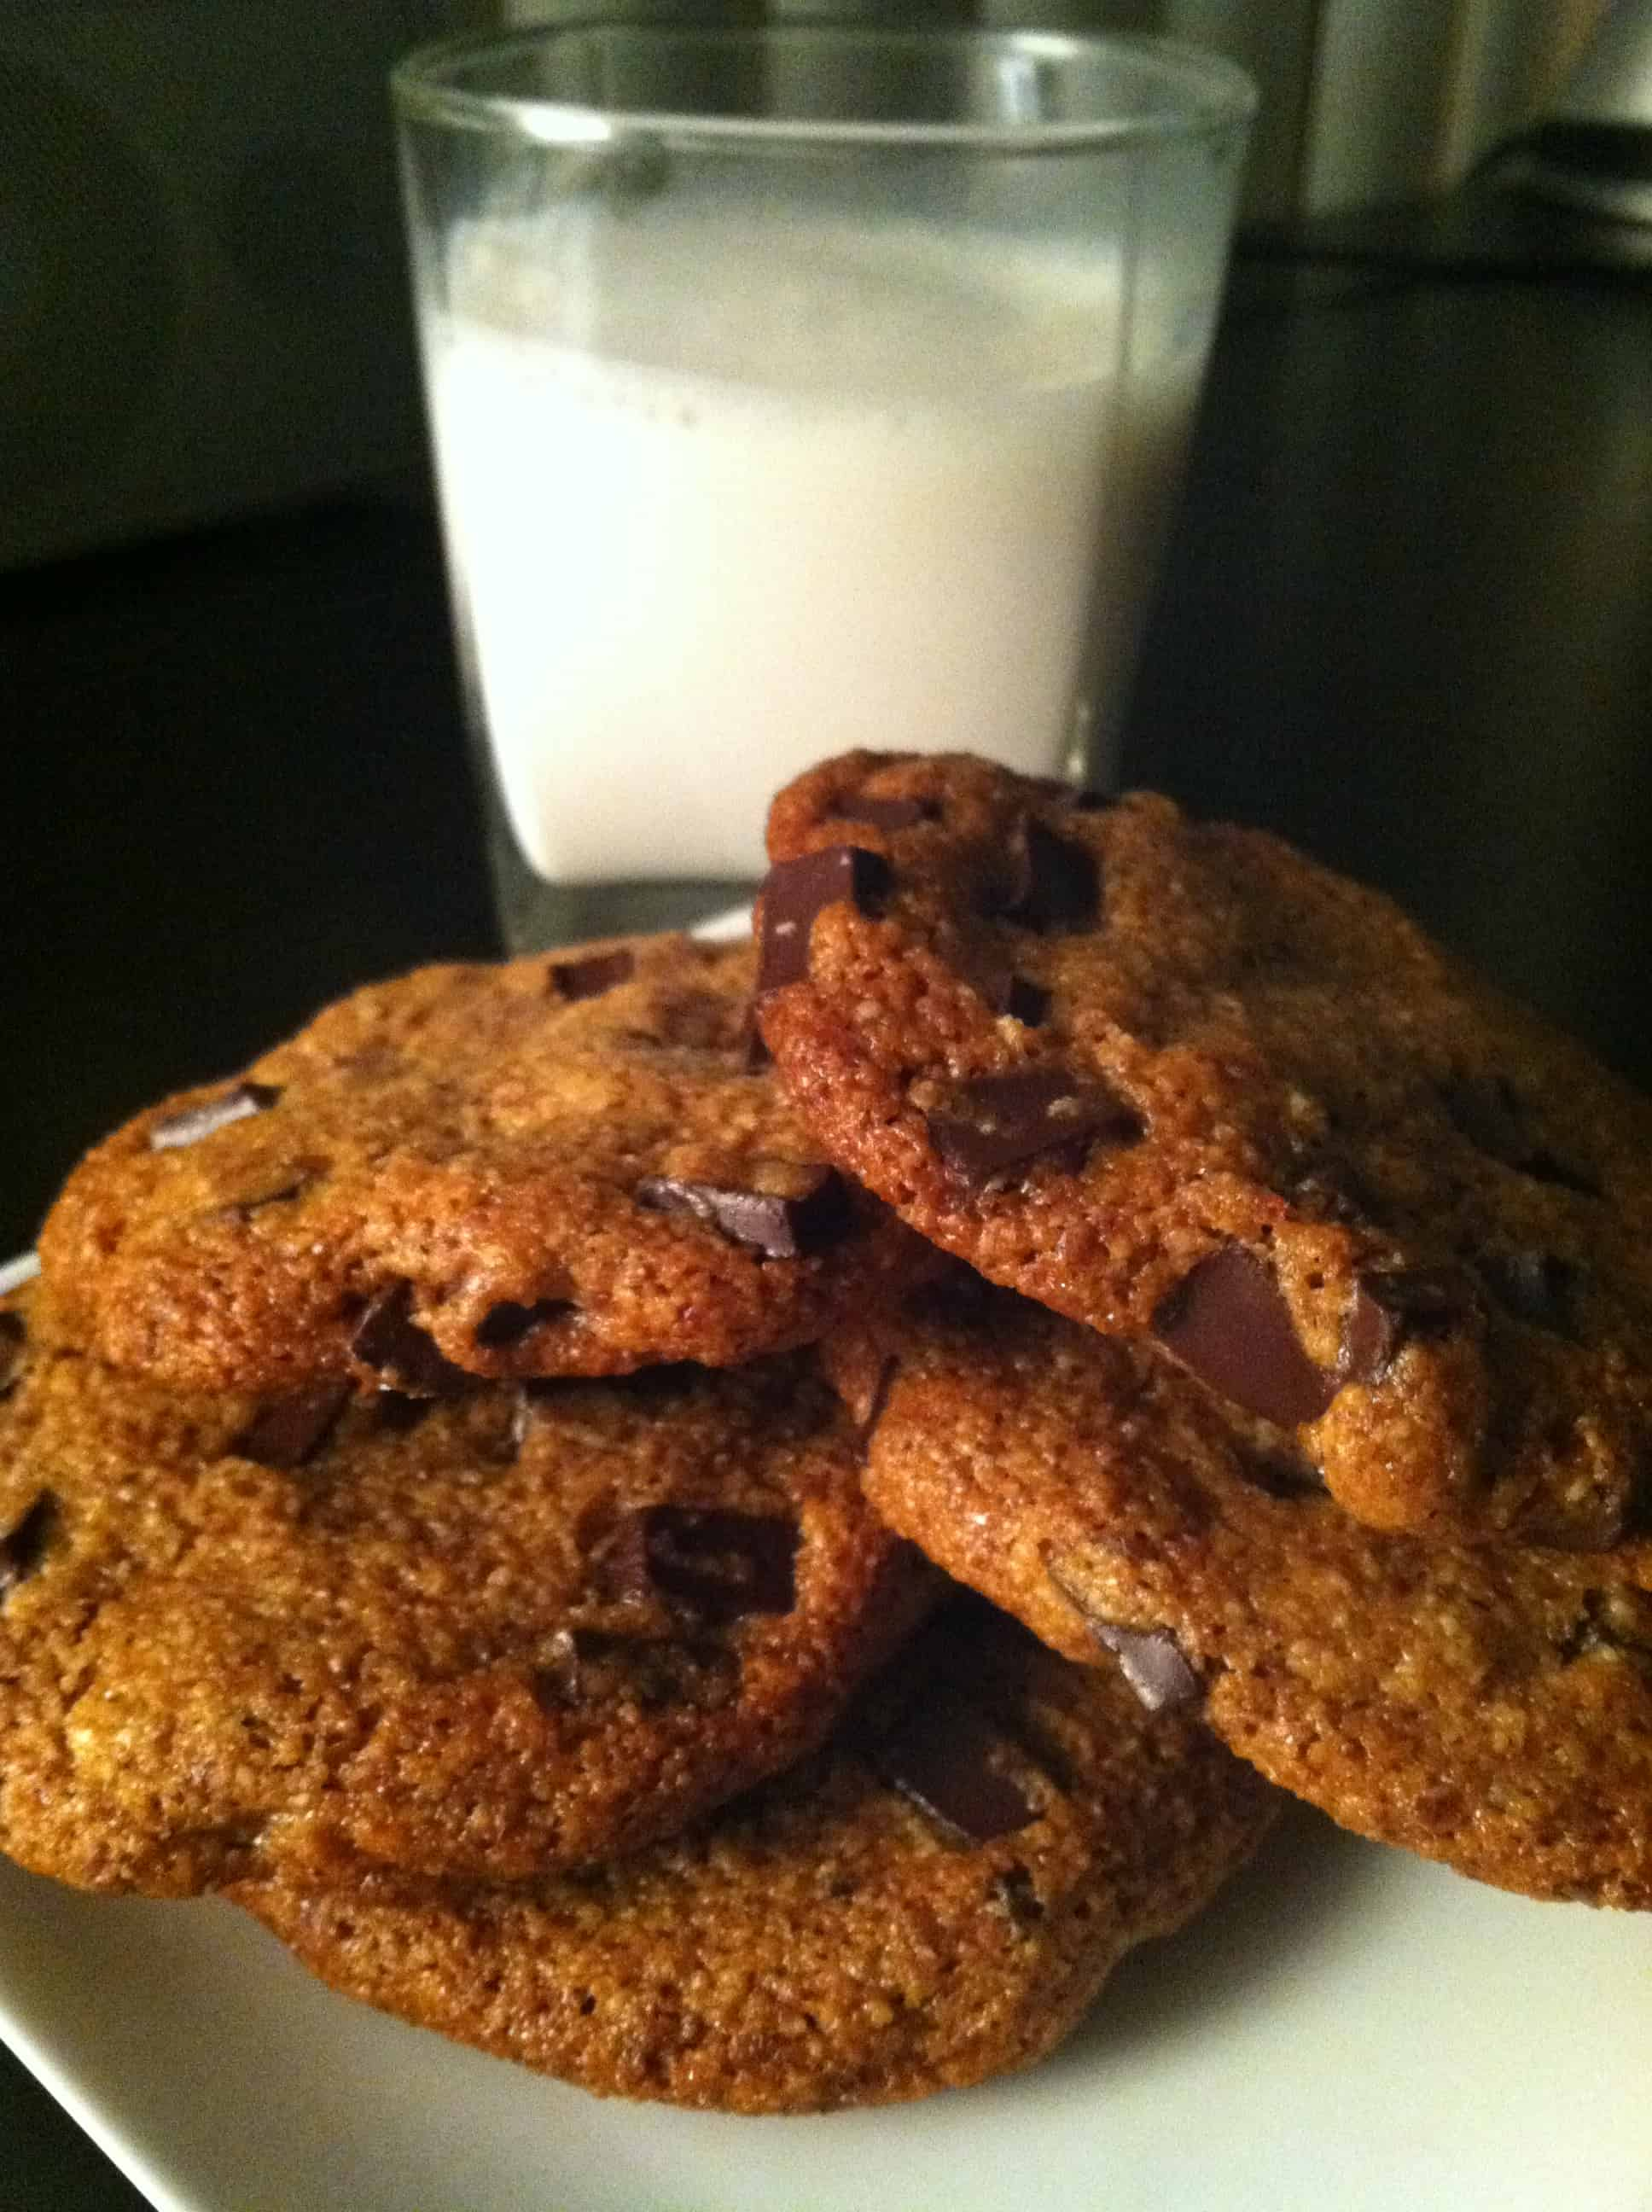 The Power of Chocolate Chip Cookies: gluten-free, dairy-free, vegan recipe